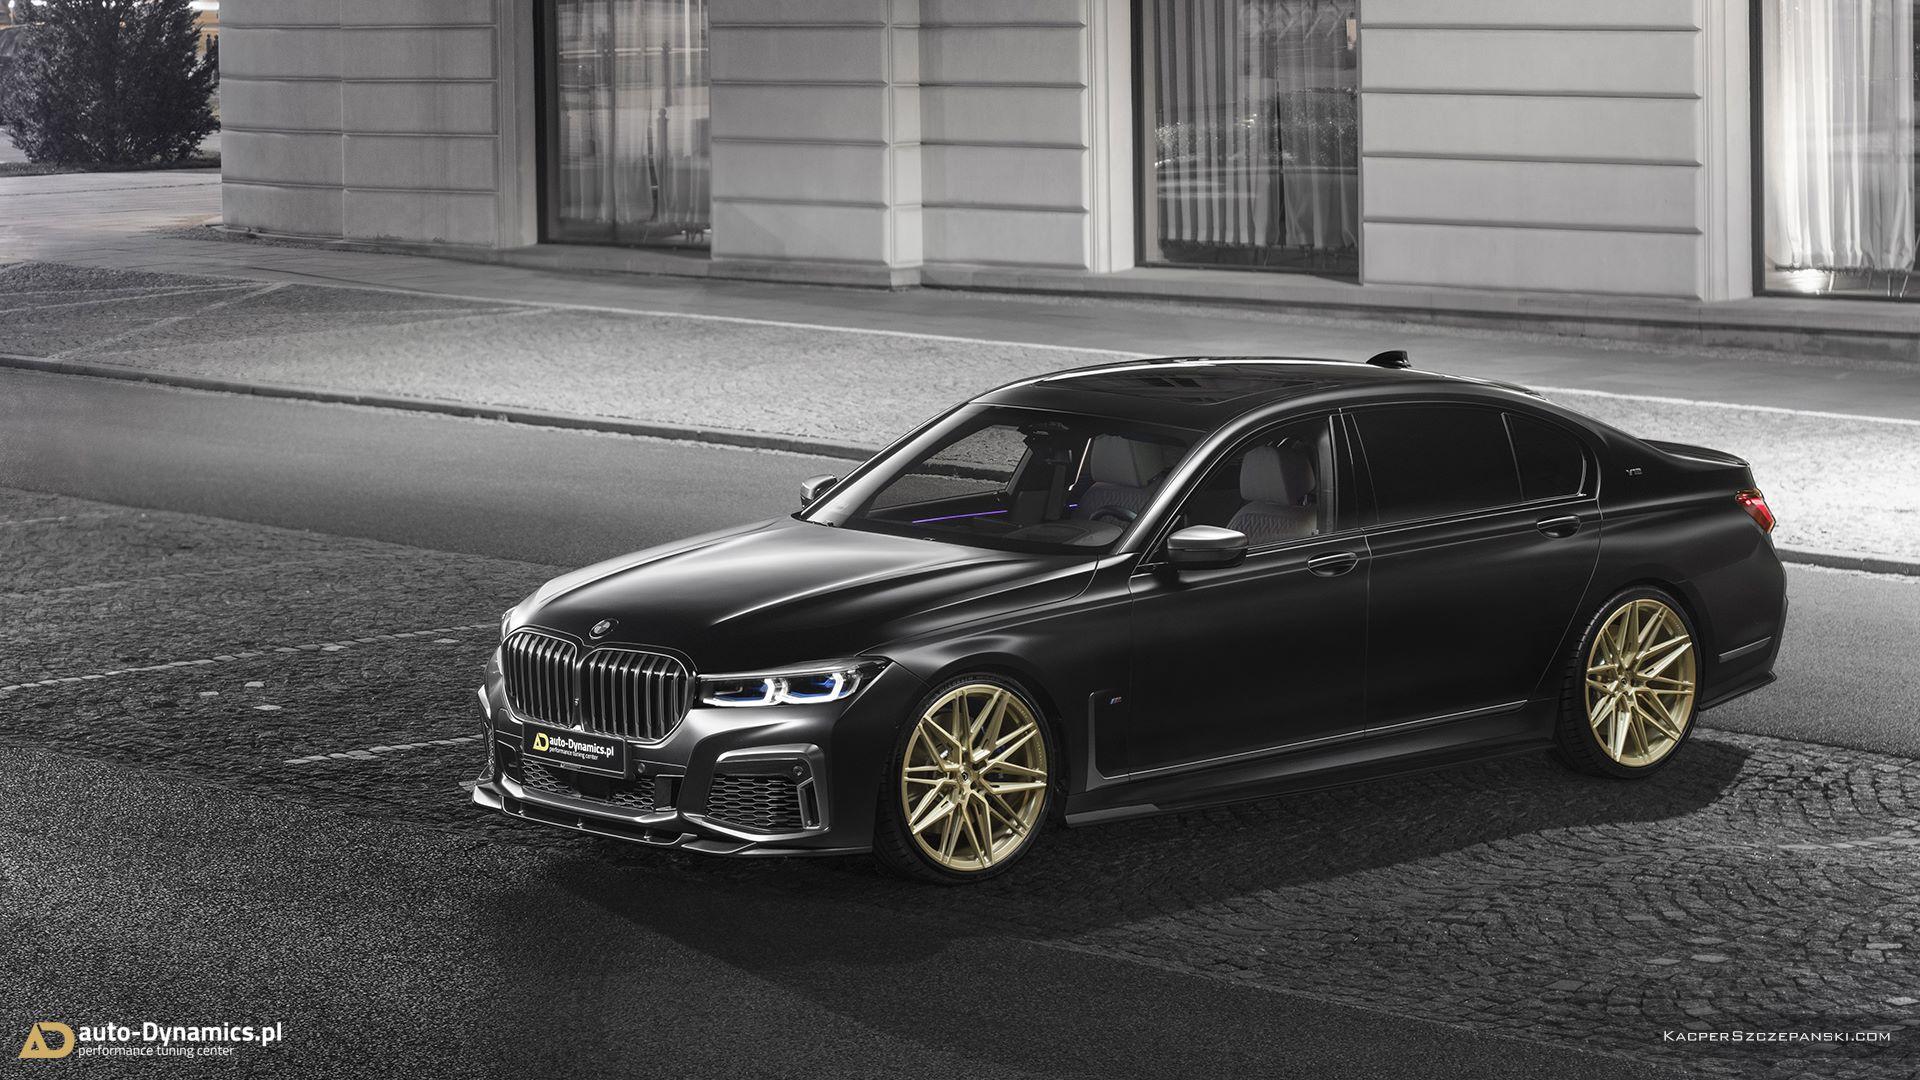 BMW-M760Li-by-Auto-Dynamics-1